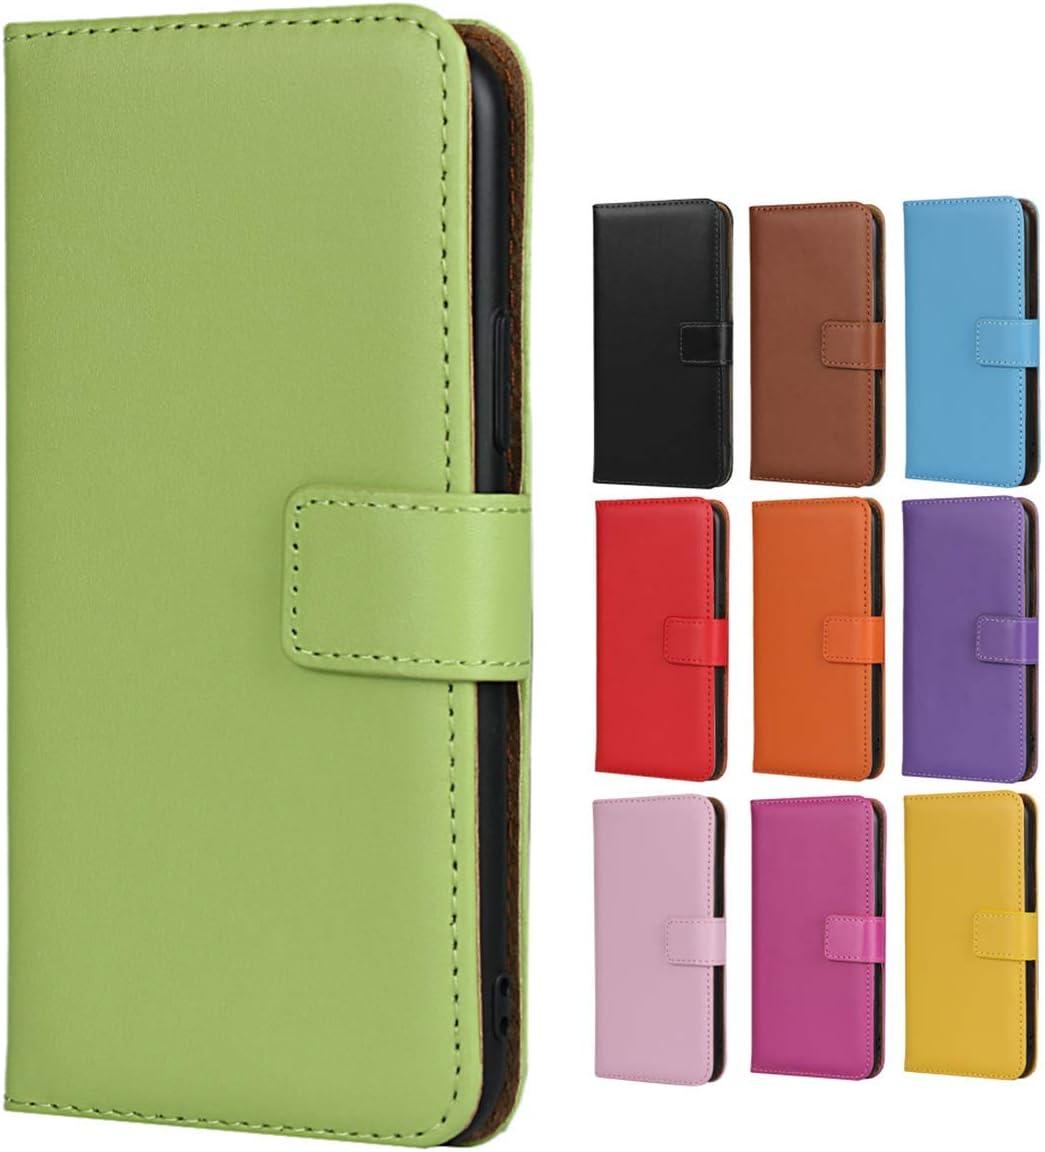 Jaorty iPhone 6 Plus/6s Plus Case,Genuine Premium Leather Folio Wallet Case Flip Cover Case Kickstand Feature & Magnetic Closure & Card Slots/Cash Compartment iPhone 6 Plus/6s Plus,Green